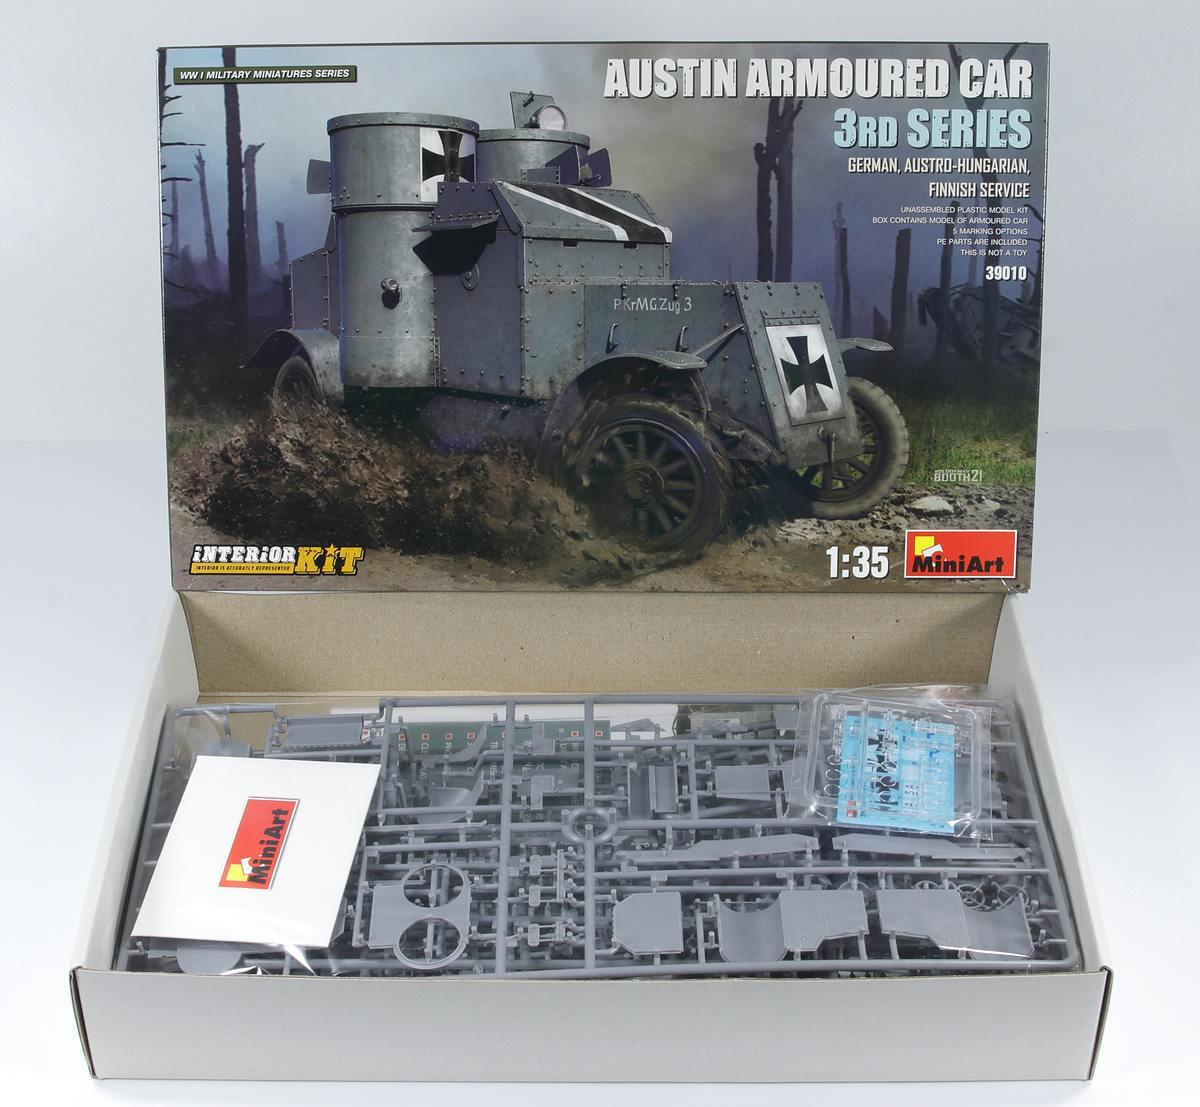 MiniArt-39010Austin-Armoured-Car-3rd-Series-German-3 Austin Armoured Car 3rd Series German, Finnish Service in 1:35 von MiniArt #39010